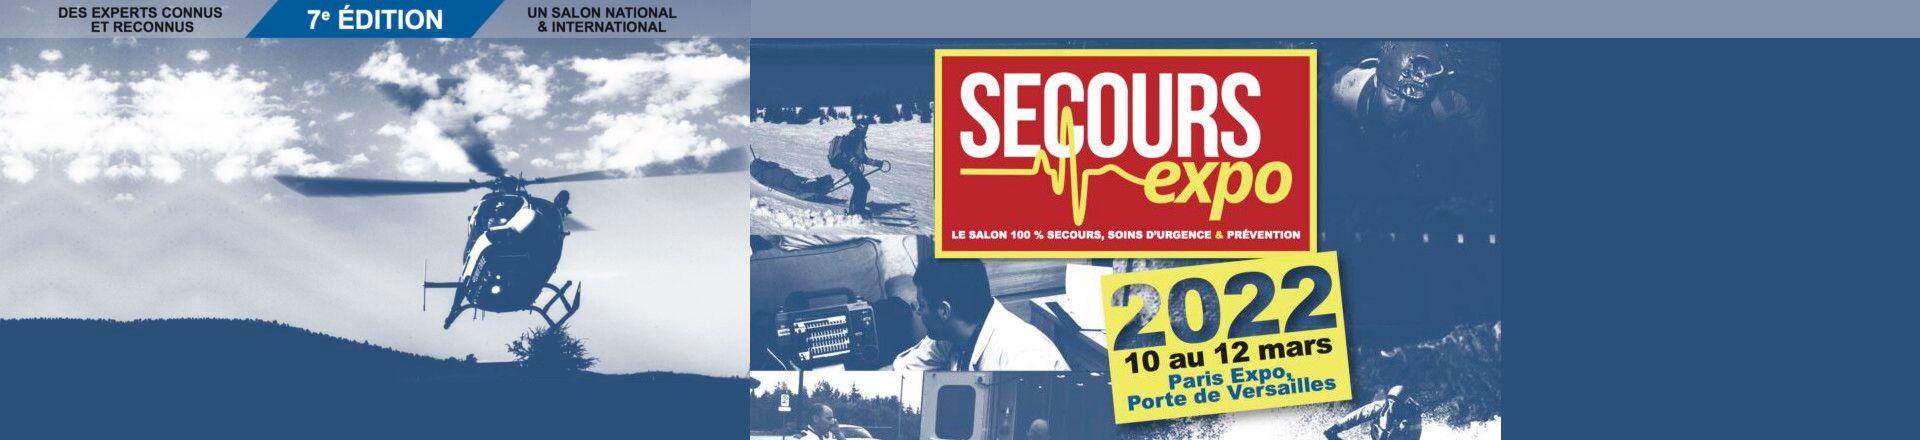 Secours Expo 2022